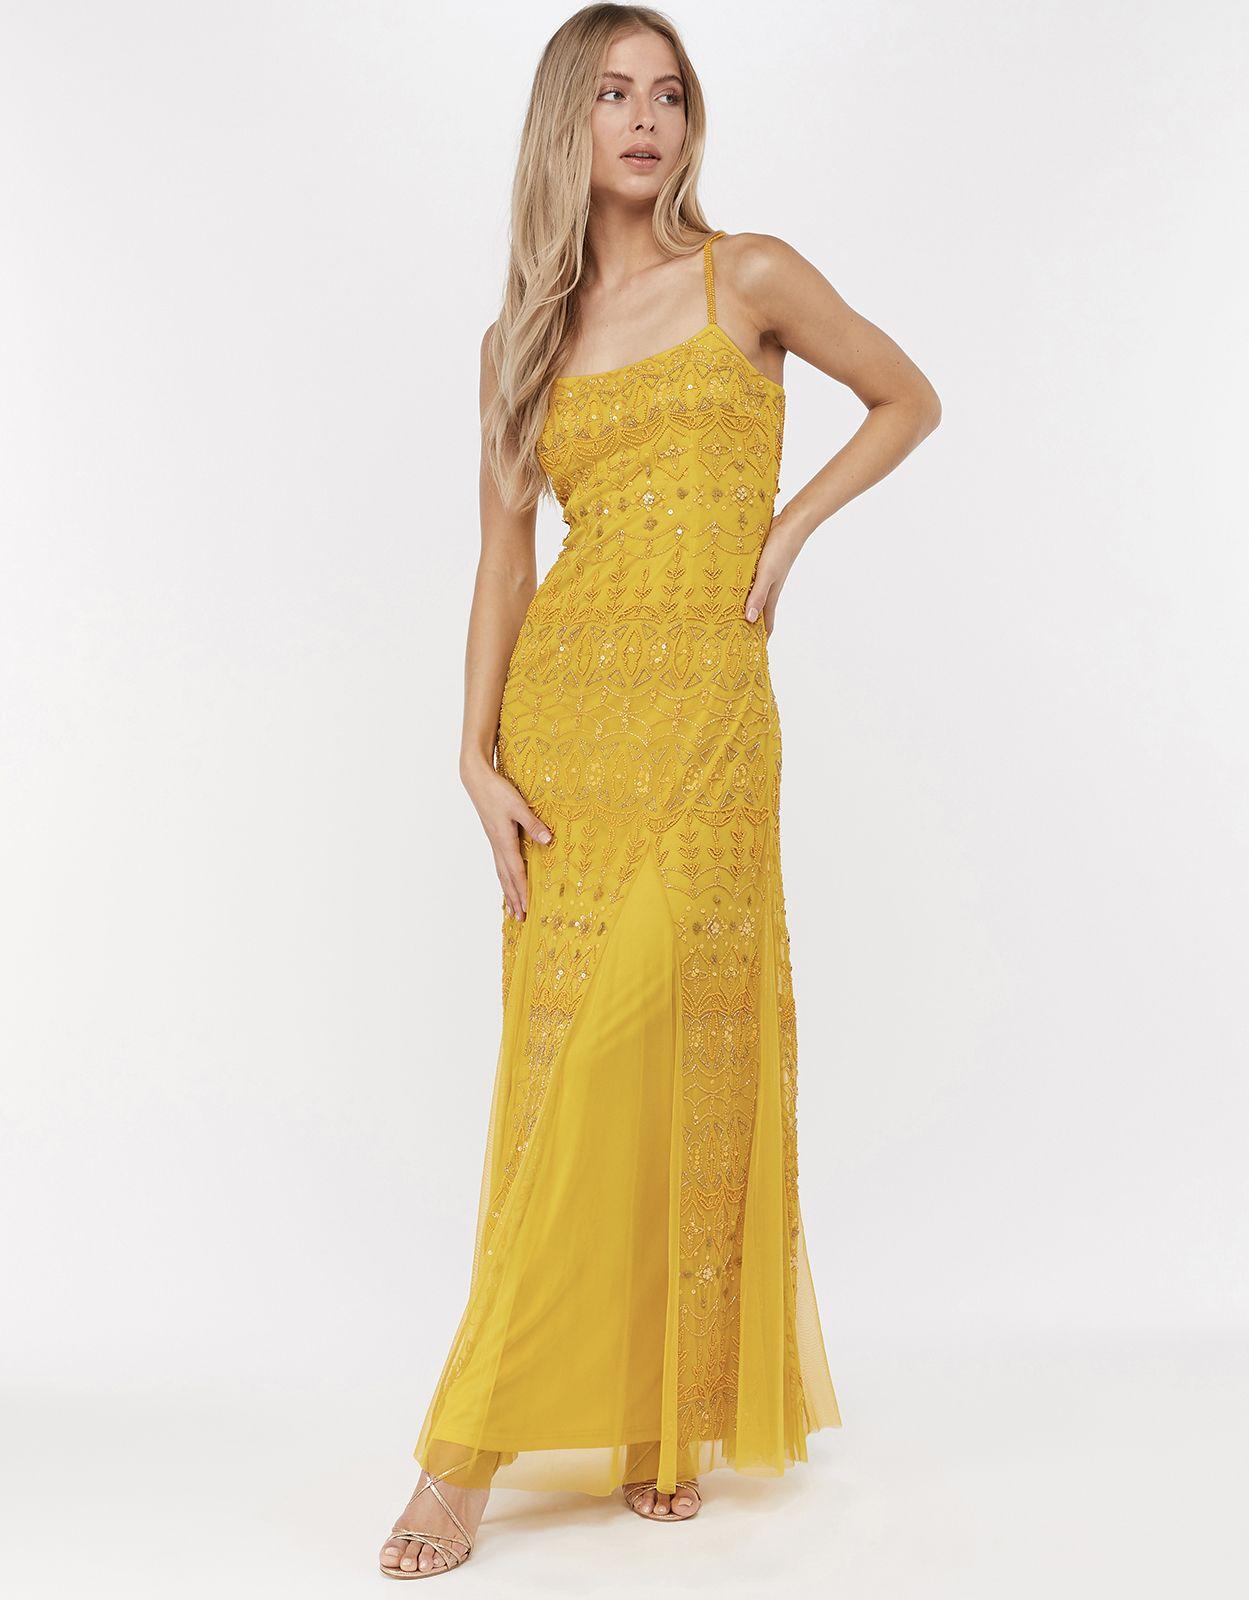 610052349a9 Prom Dresses For Tweens Uk